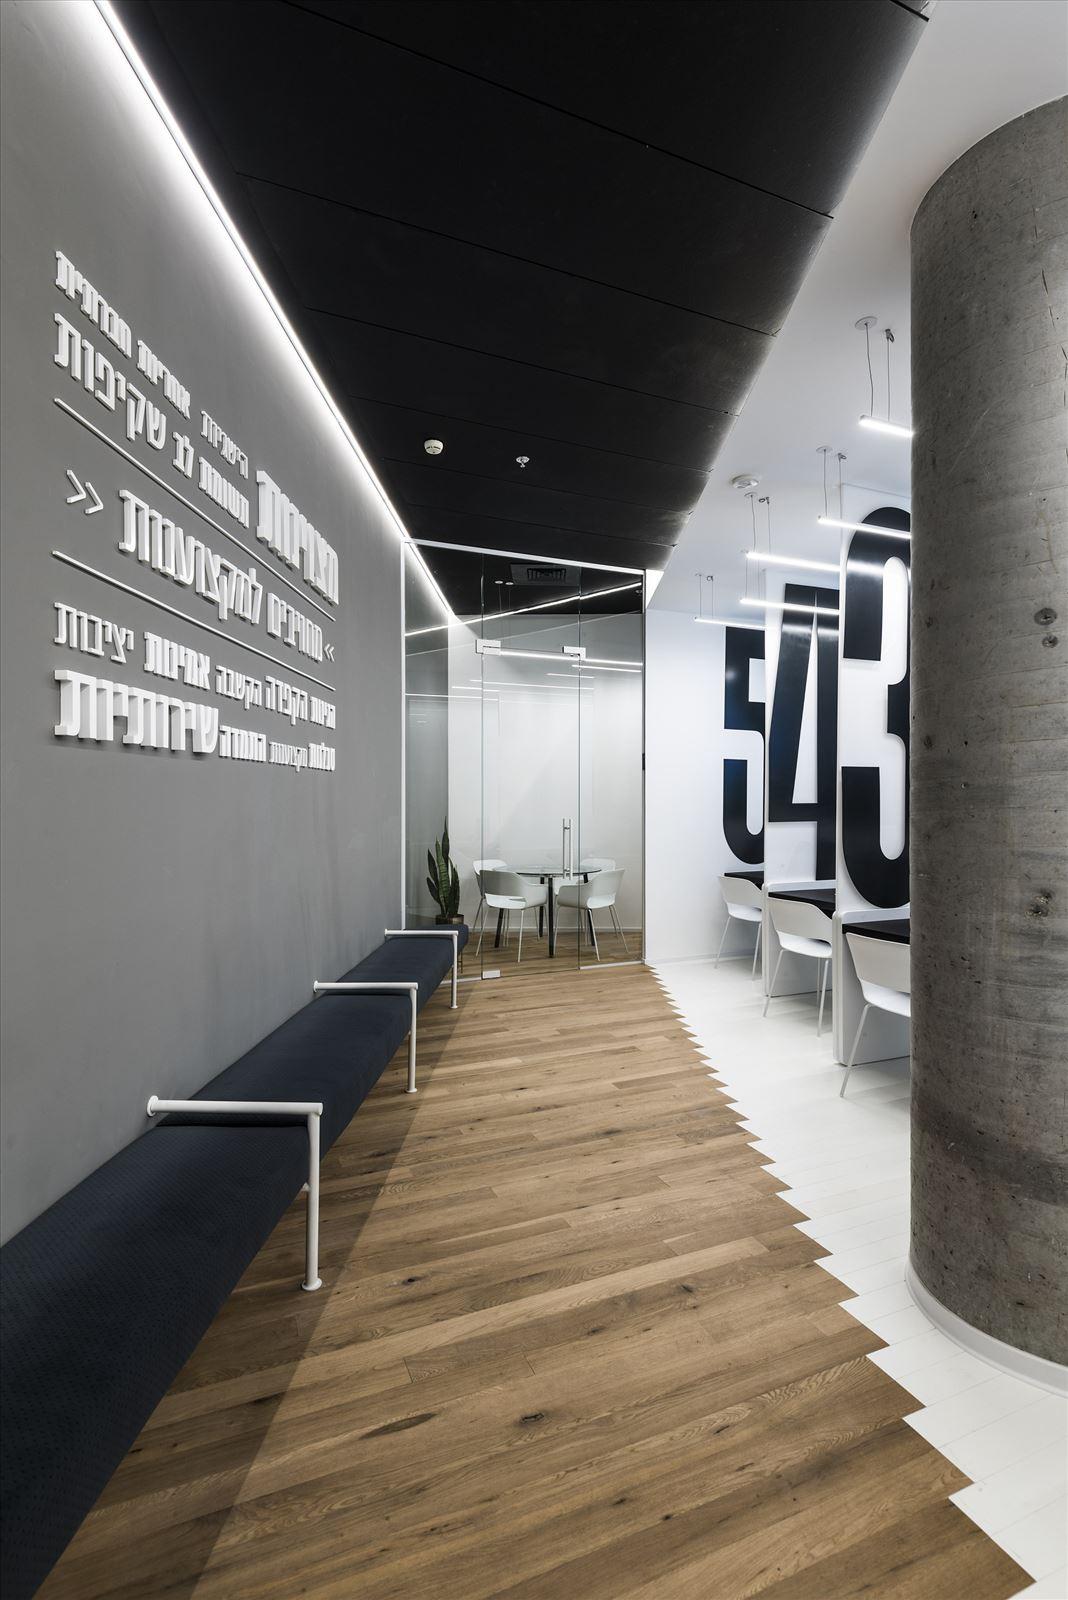 Office lighting project תאורת המסדרון במשרד נעשתה על ידי קמחי תאורה